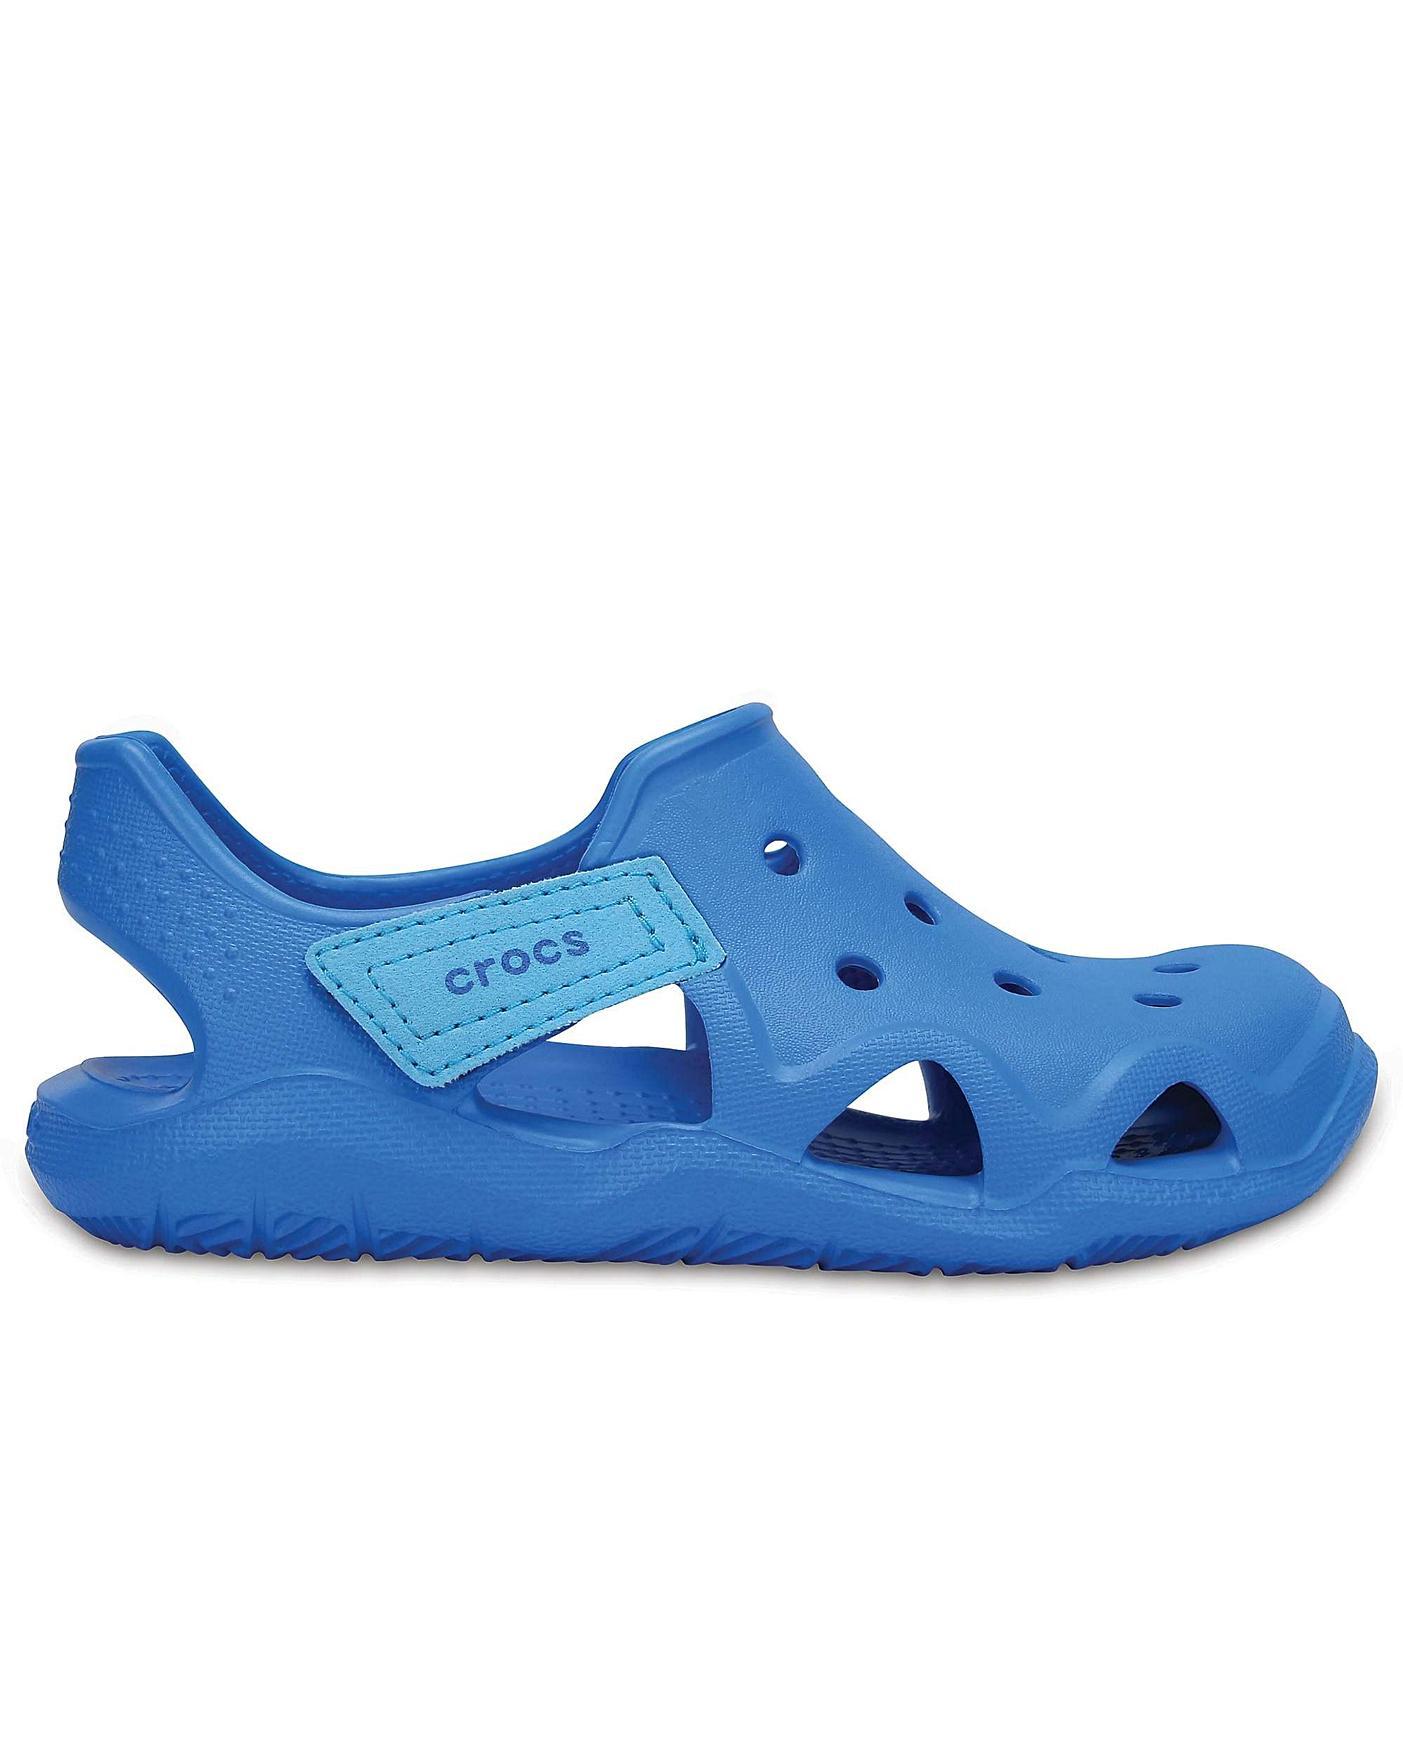 958333ebf98 Crocs Swiftwater Wave Boys Sandals